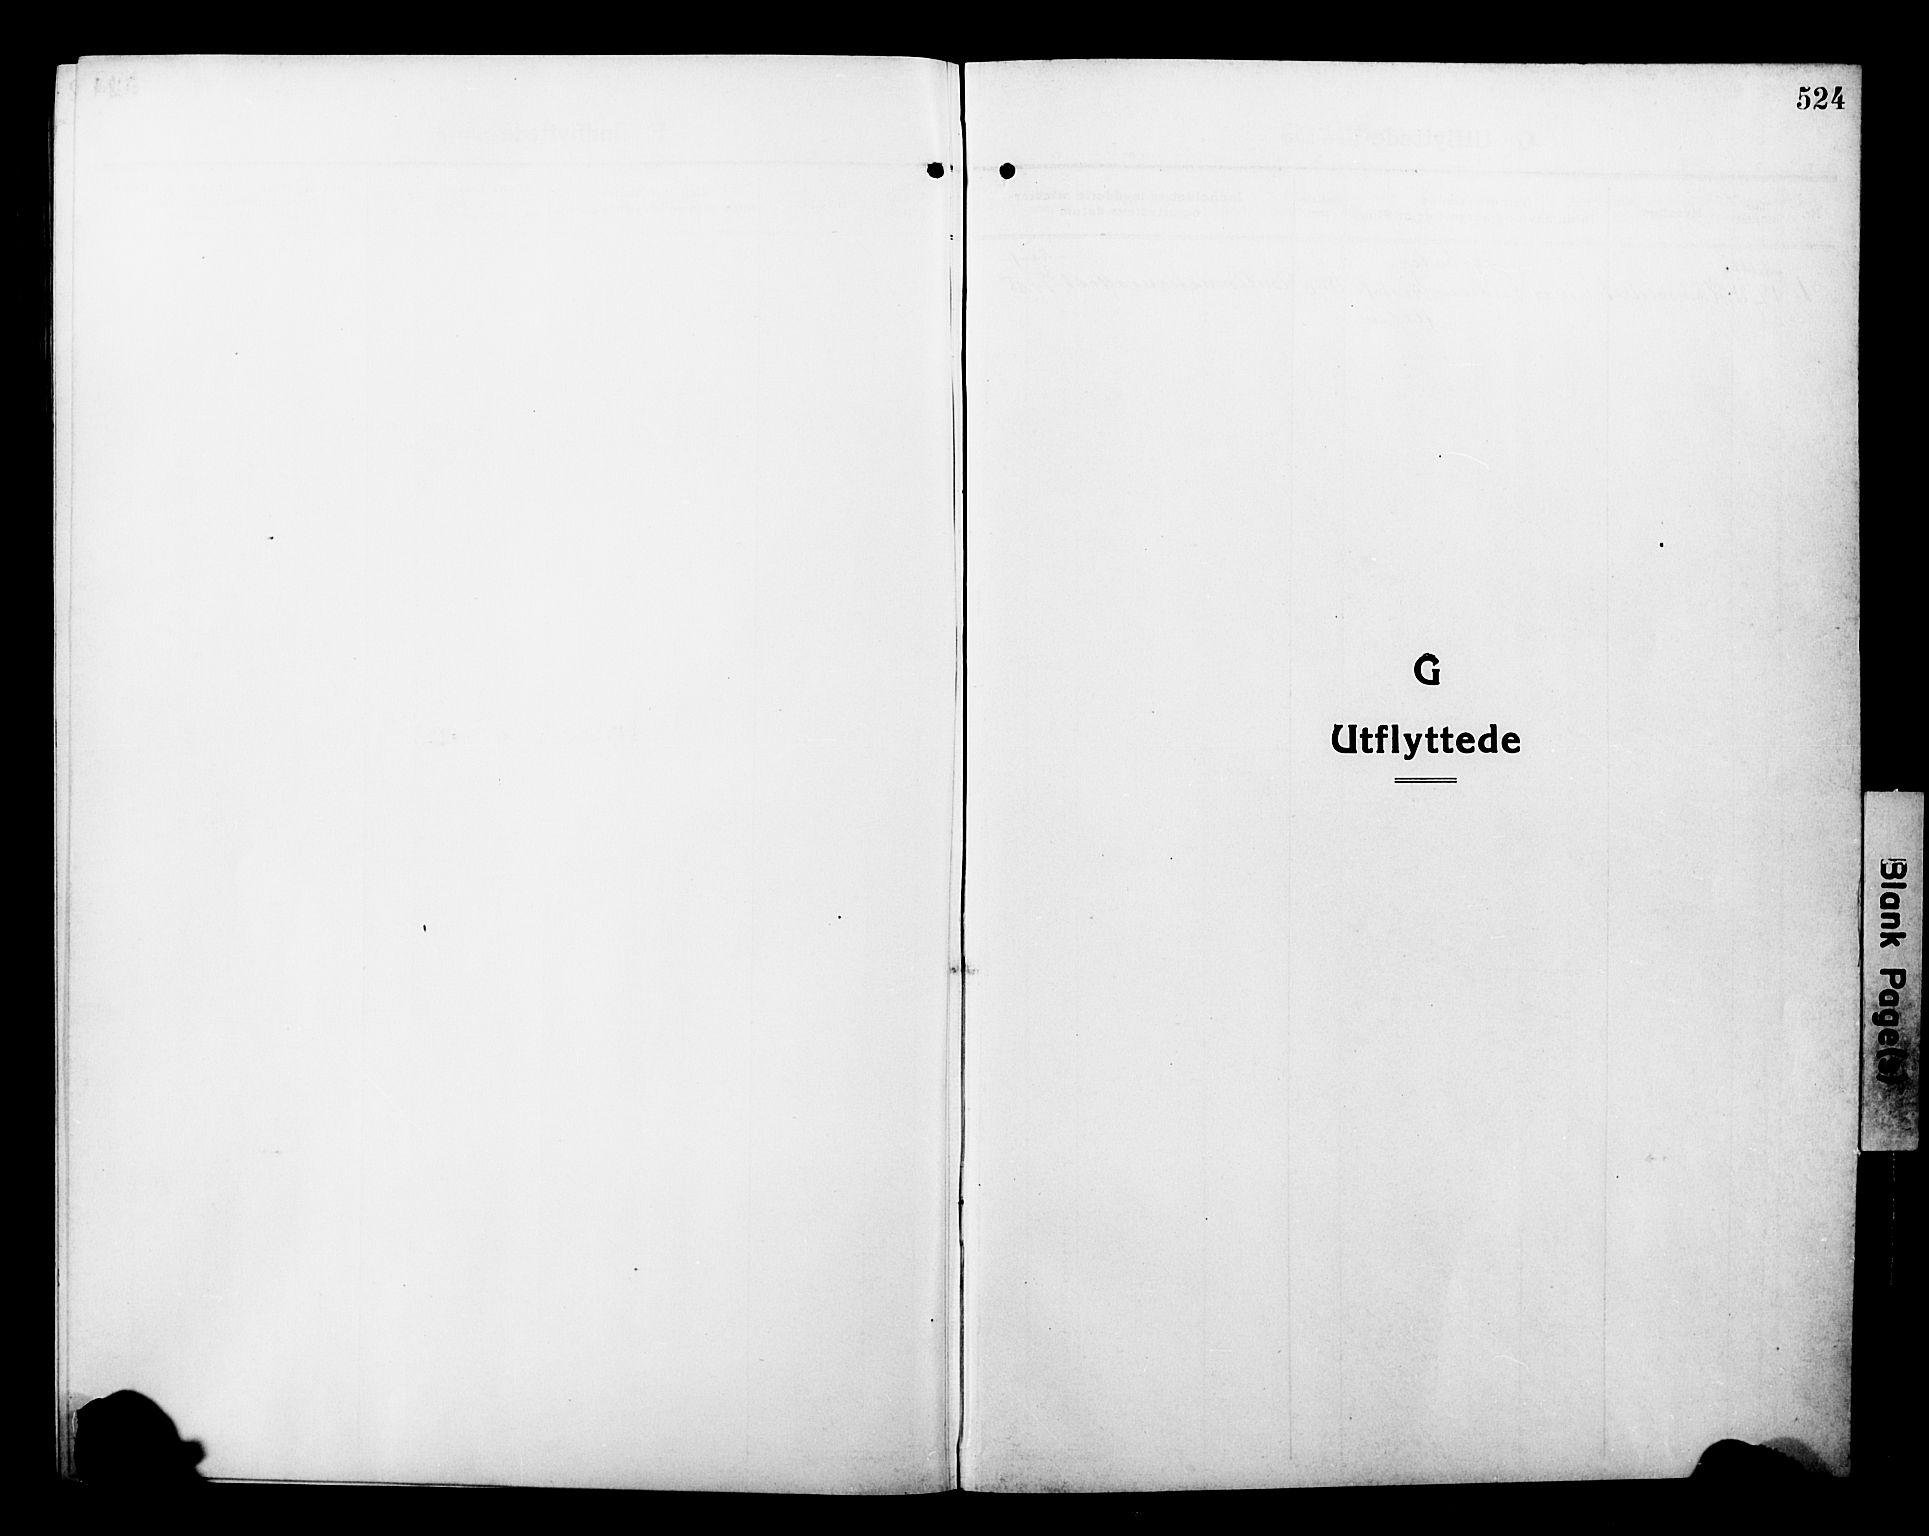 SATØ, Tromsø sokneprestkontor/stiftsprosti/domprosti, G/Gb/L0009klokker: Klokkerbok nr. 9, 1915-1925, s. 524